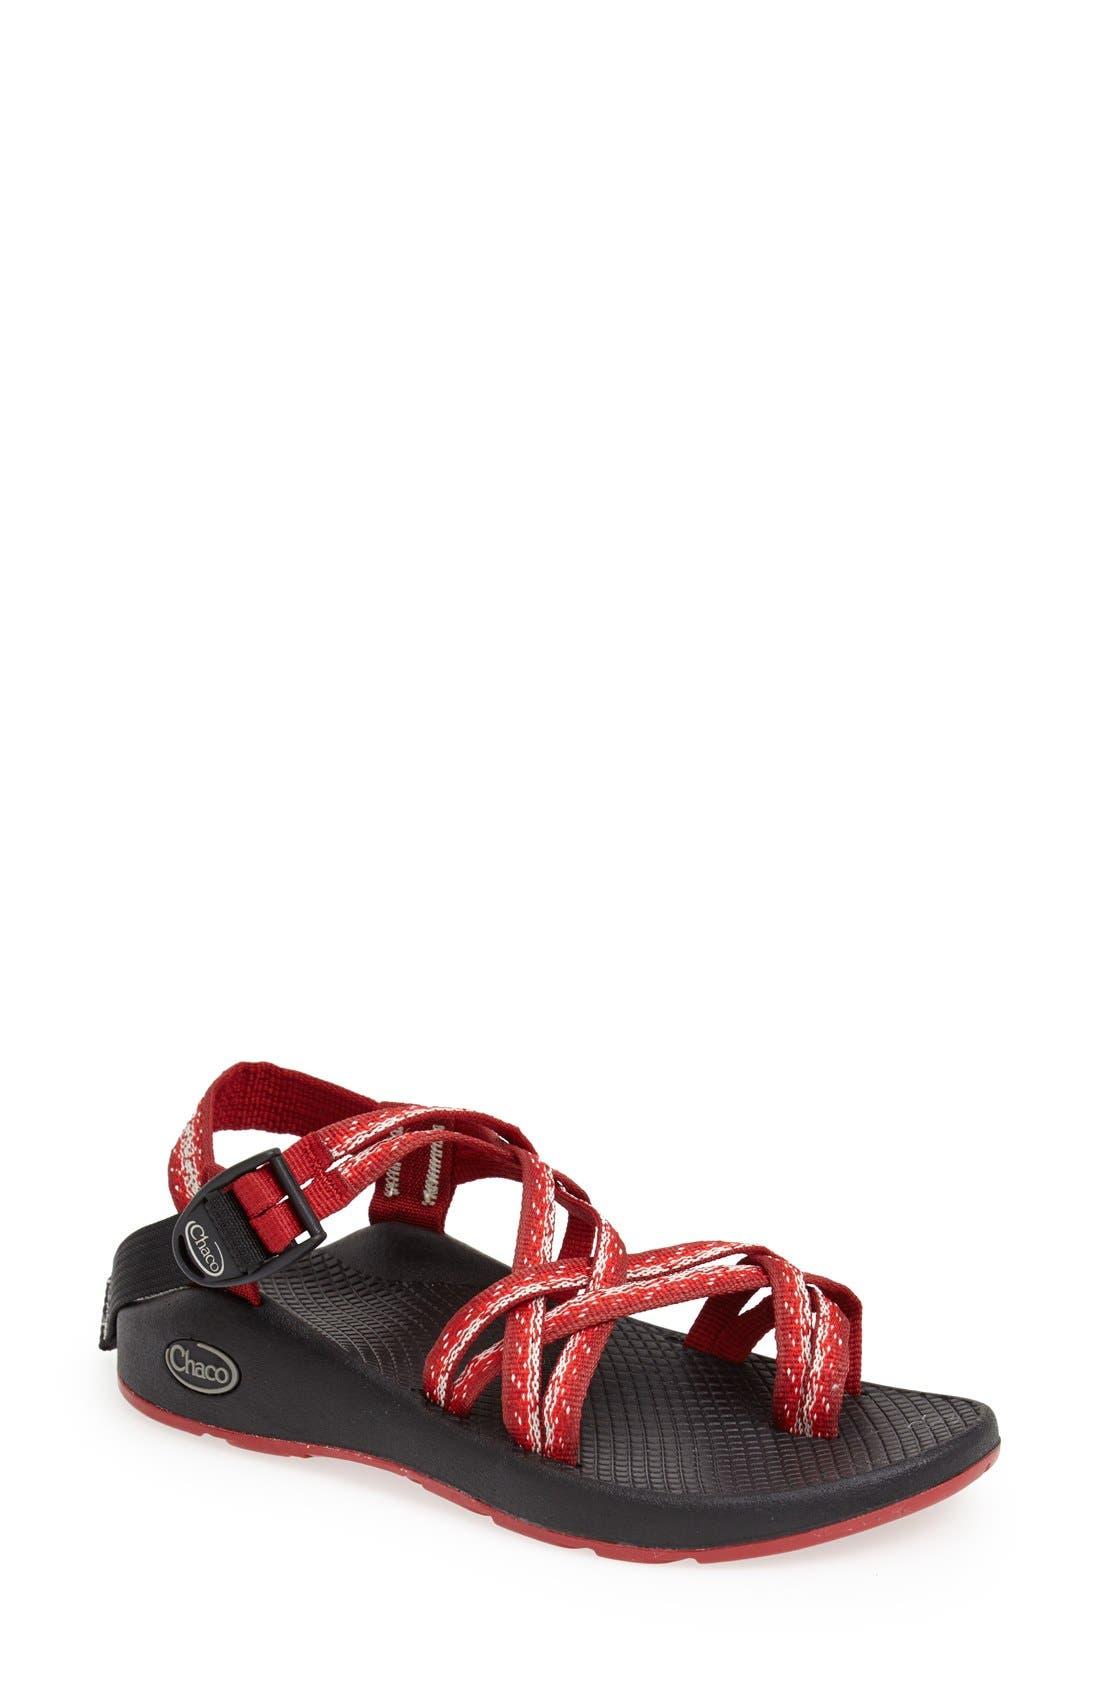 Main Image - Chaco 'ZX2 Yampa' Sandal (Women)